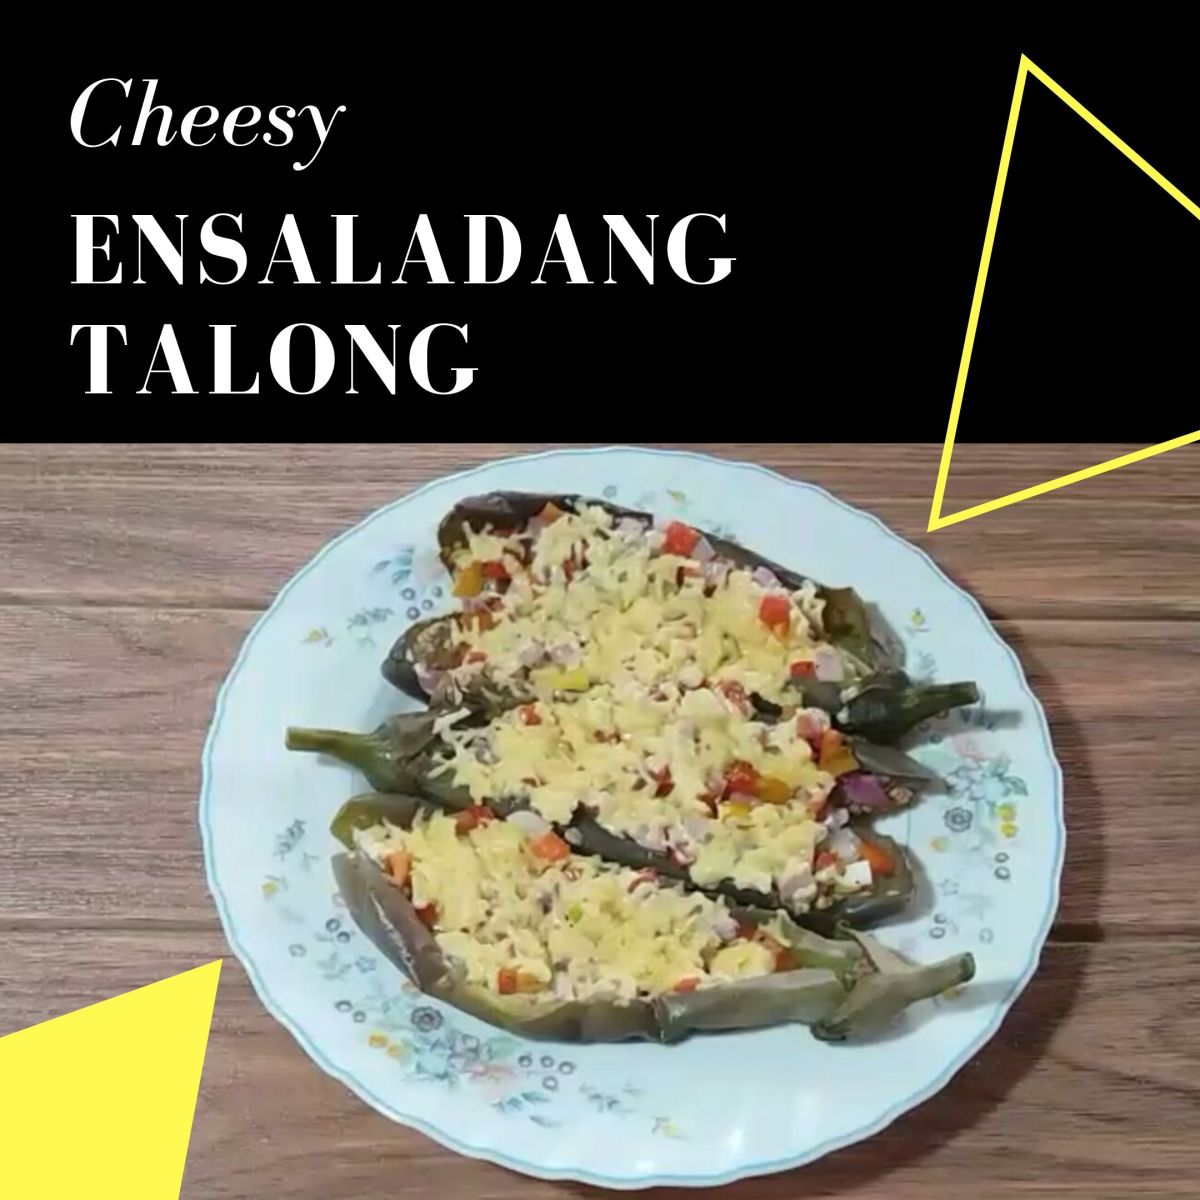 Learn how to make cheesy ensaladang talong (eggplant salad).